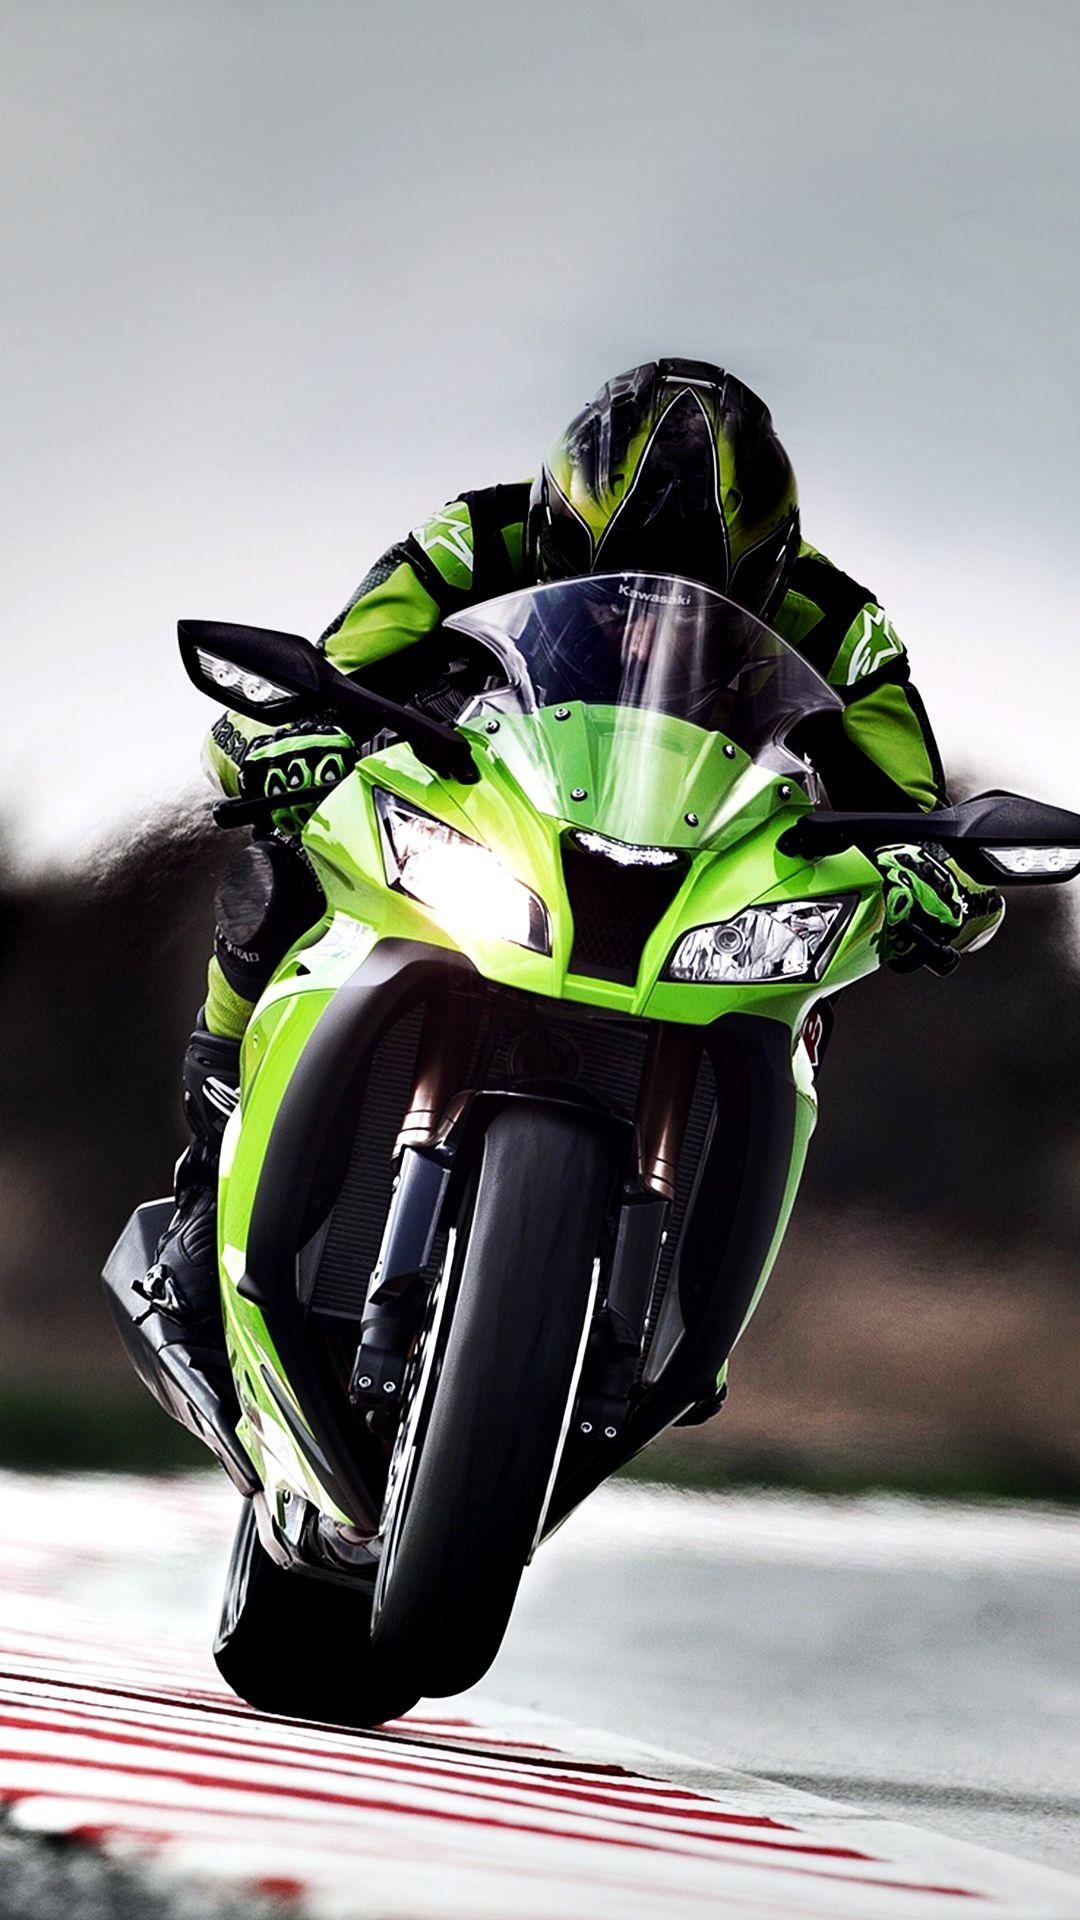 Bike Wallpaper 4k Iphone Ideas In 2020 Super Bikes Ninja Bike Sports Bikes Motorcycles